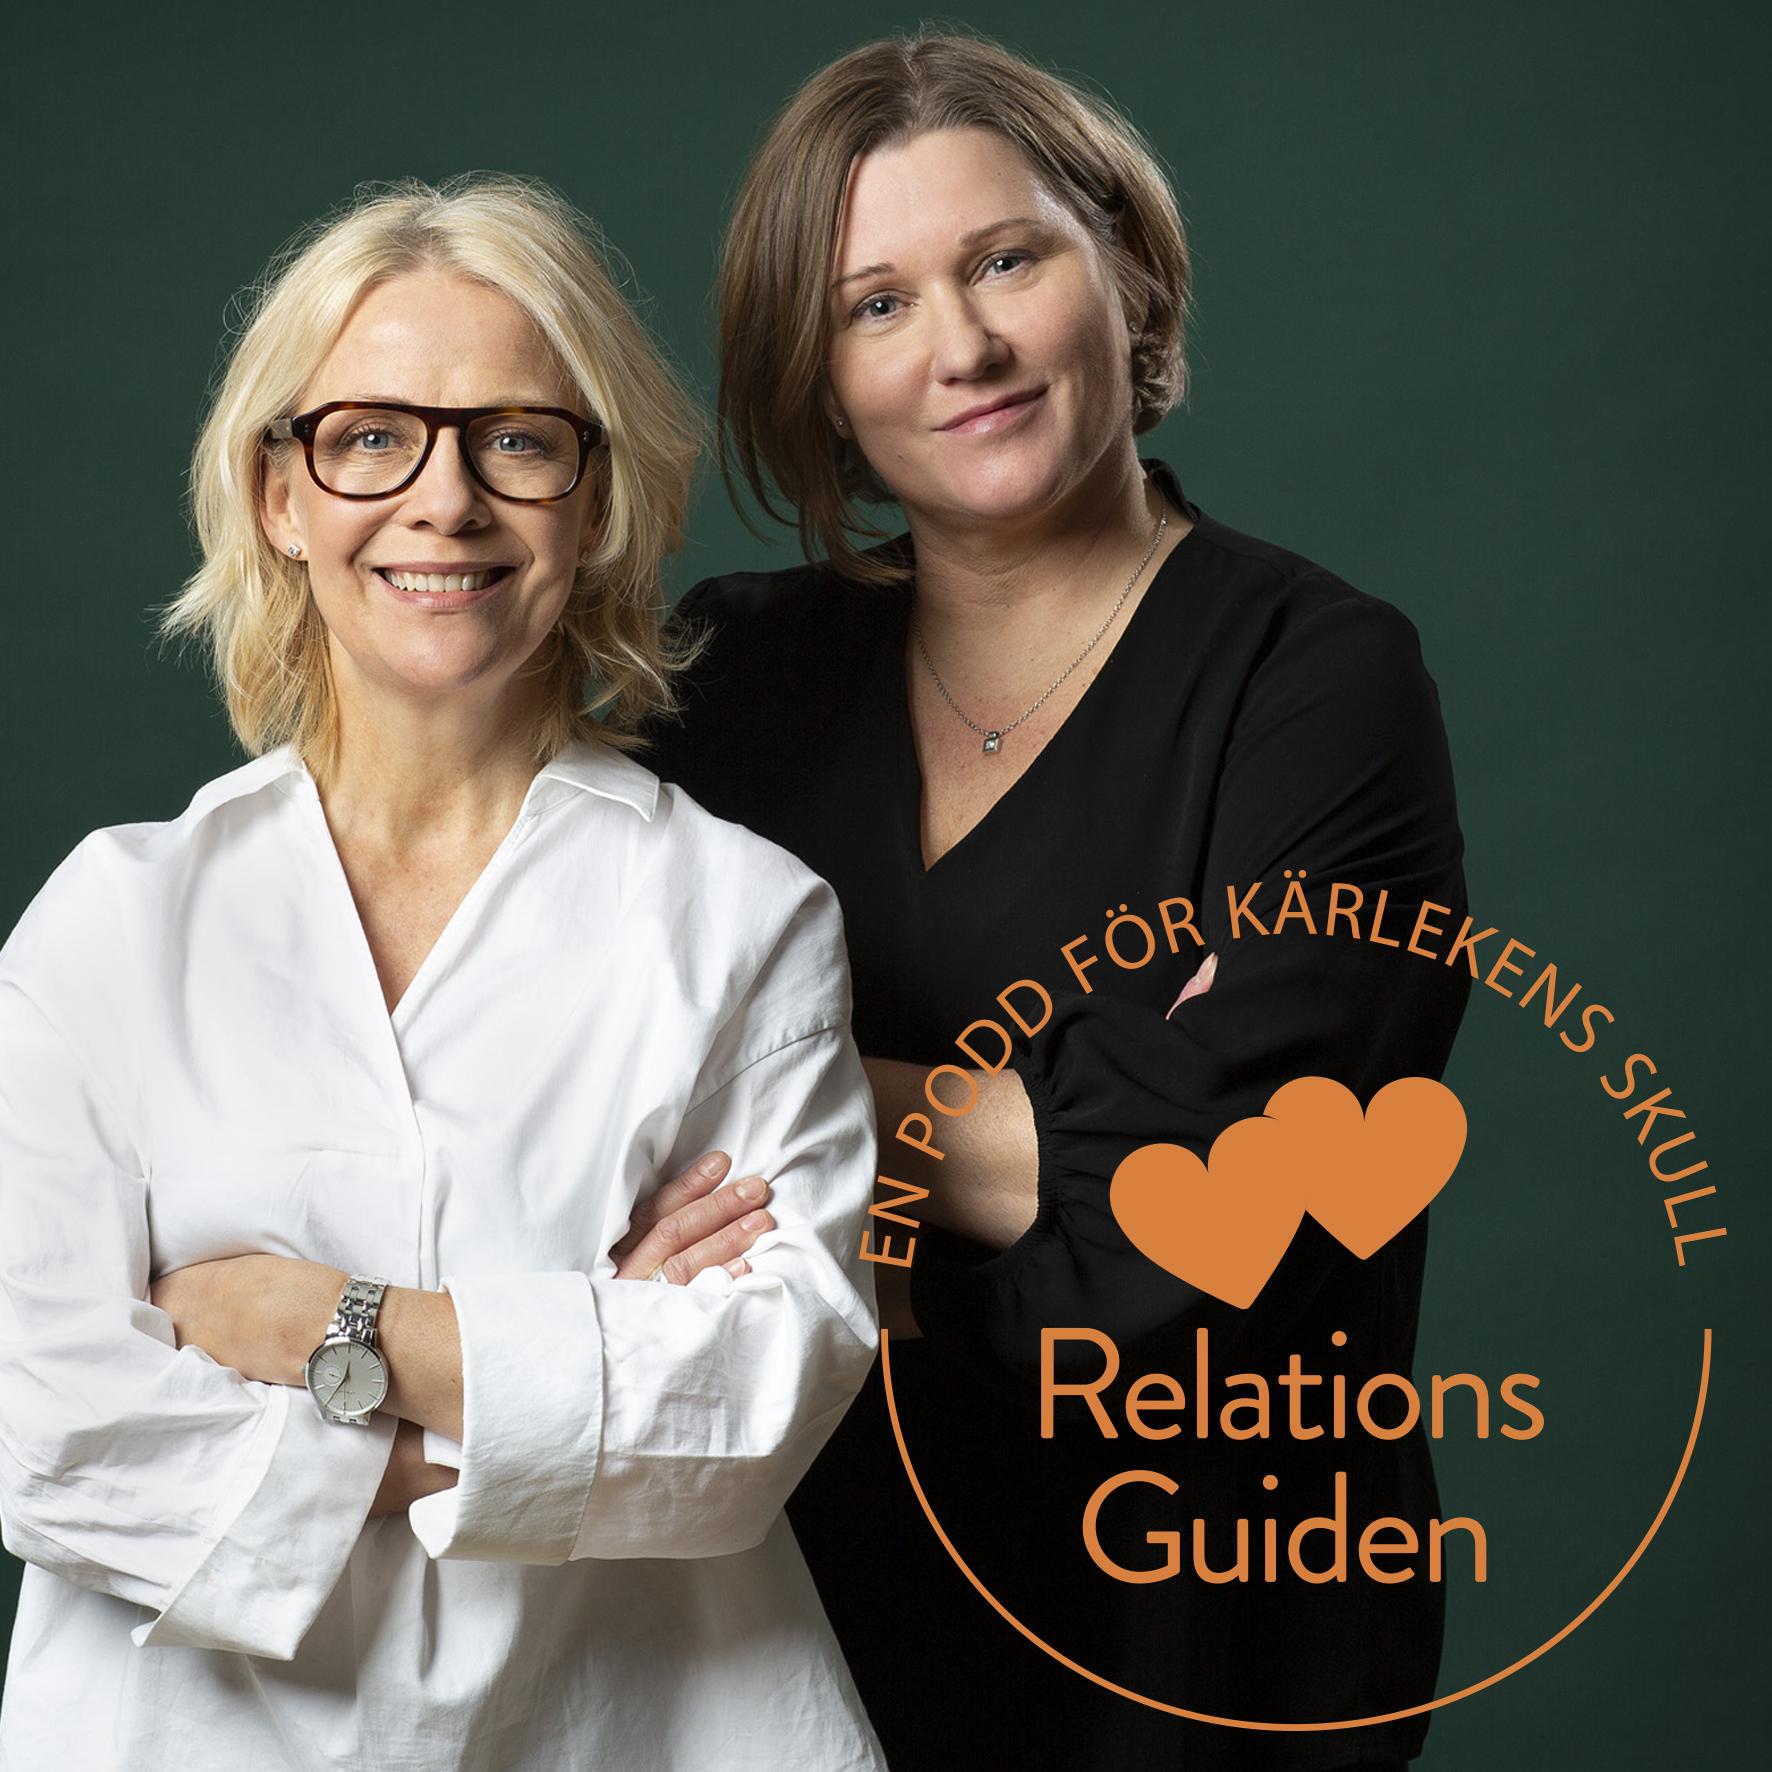 37. MeToo-dagen med Olga Persson som gäst i studion